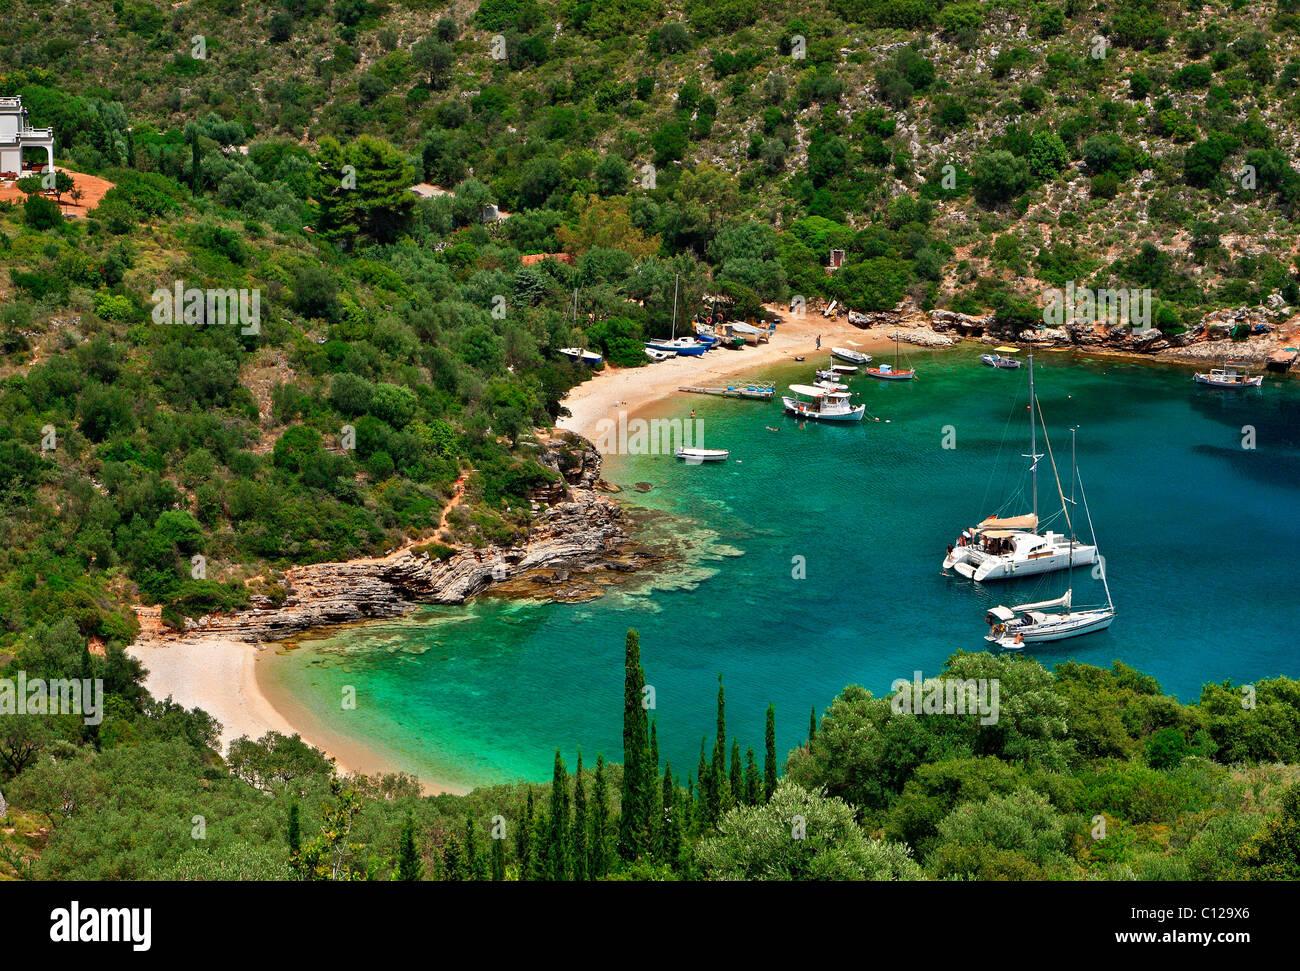 A double, heart-shaped beach called Sarakiniko, 3 km from Vathy town, capital of Ithaca island, Ionian Sea, Greece - Stock Image